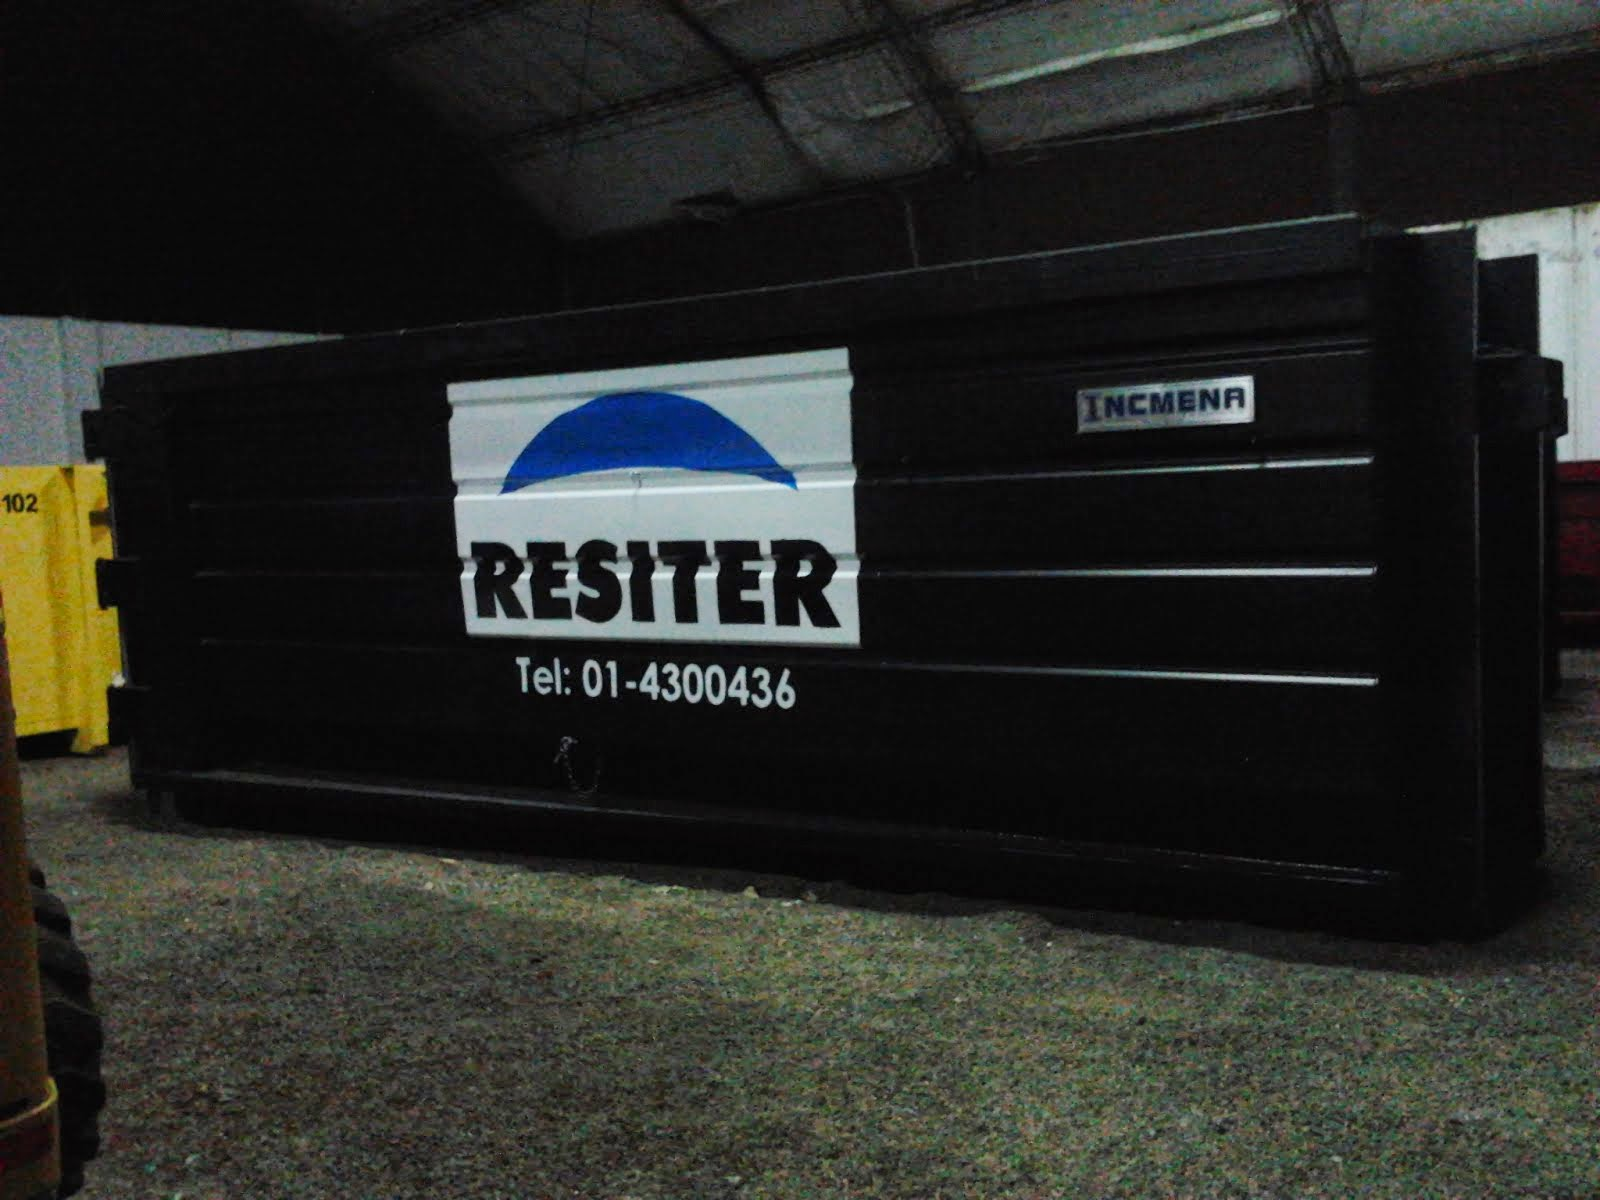 resiter - PINTADO DE CONTEINER